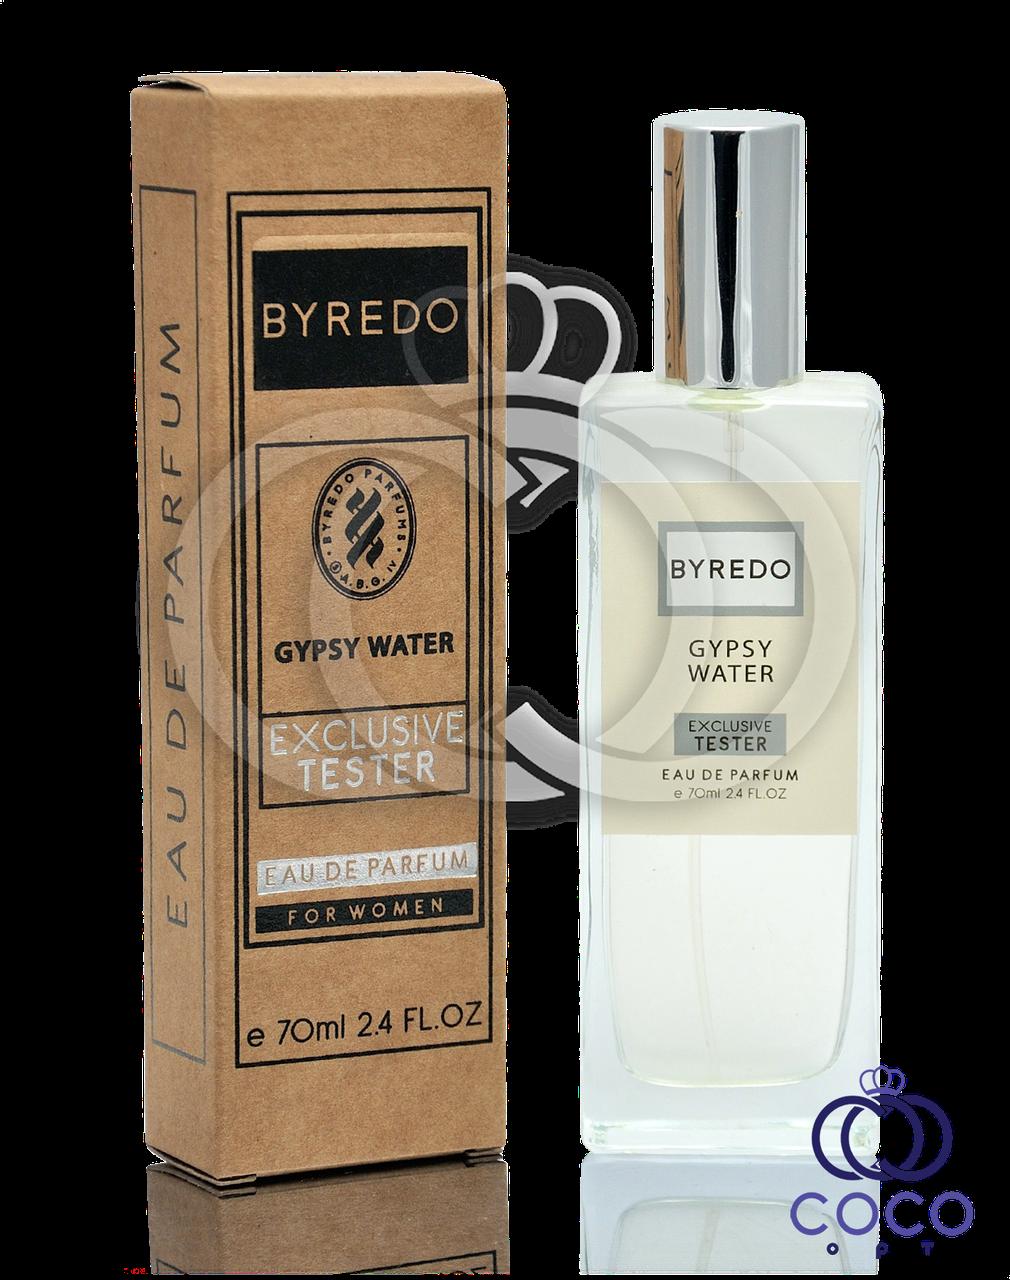 Парфюмированная вода Byredo Gypsy Water Exclusive Tester